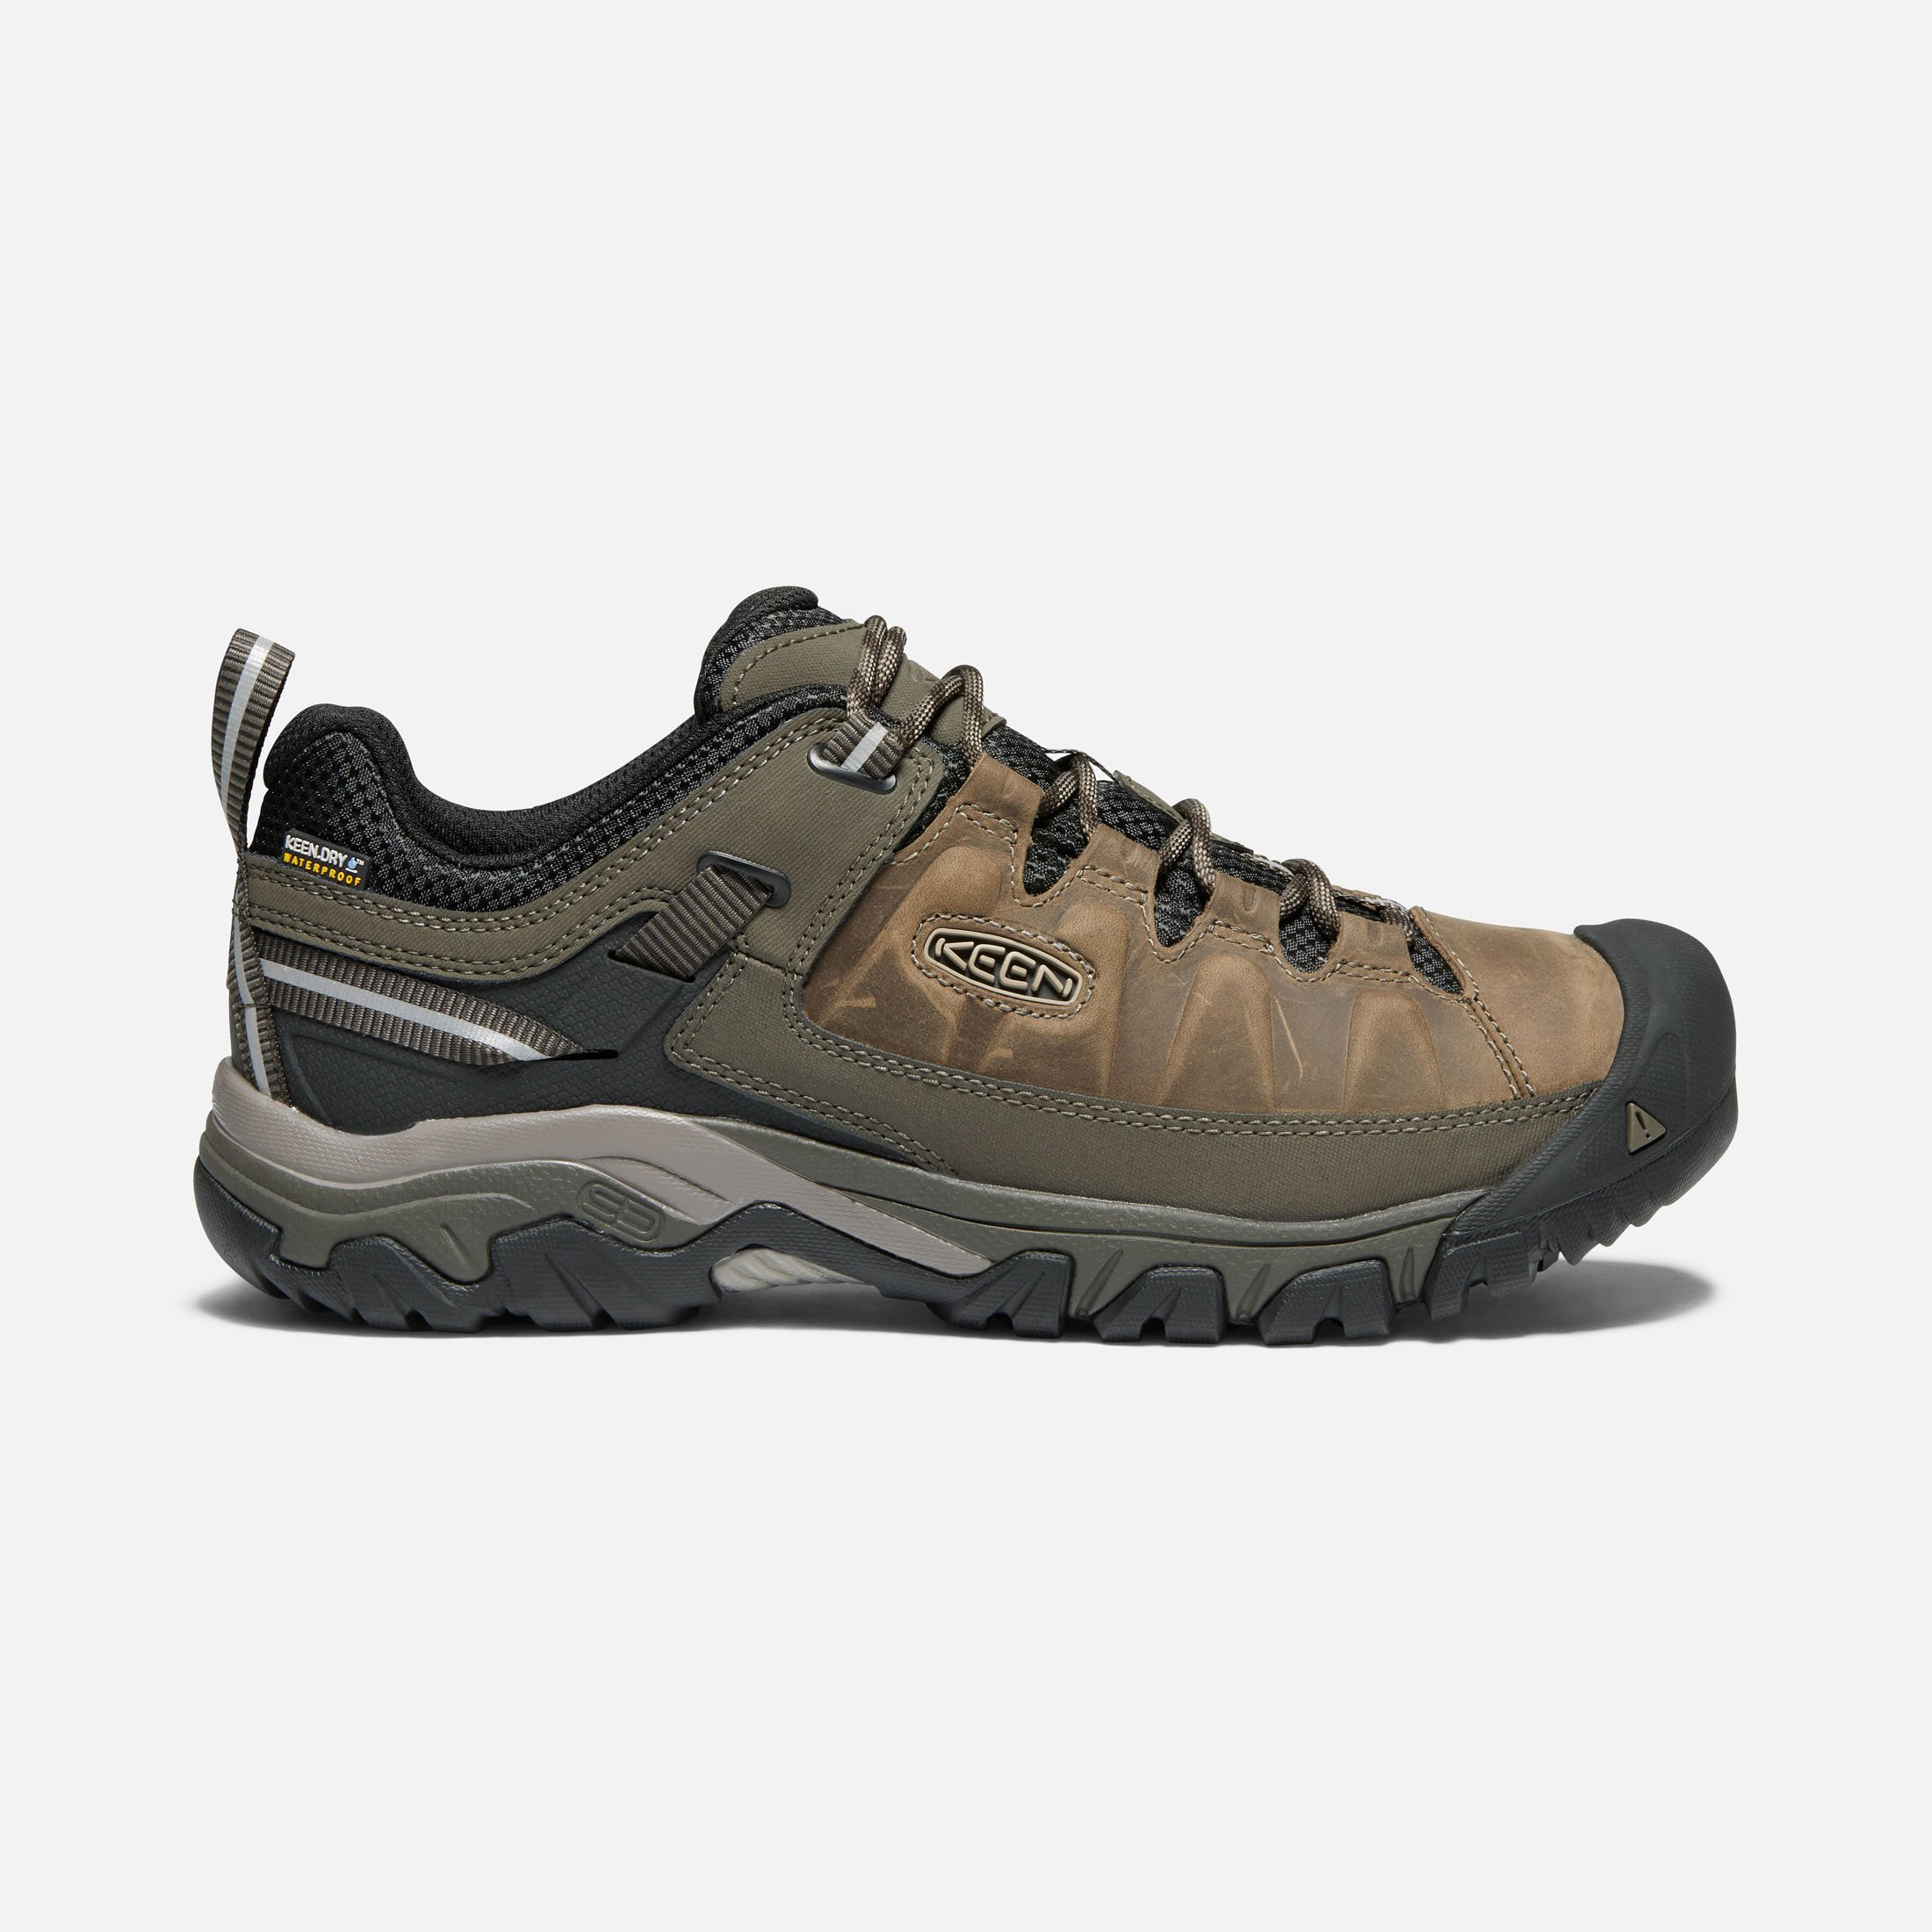 Targhee III Waterproof Wide Shoes